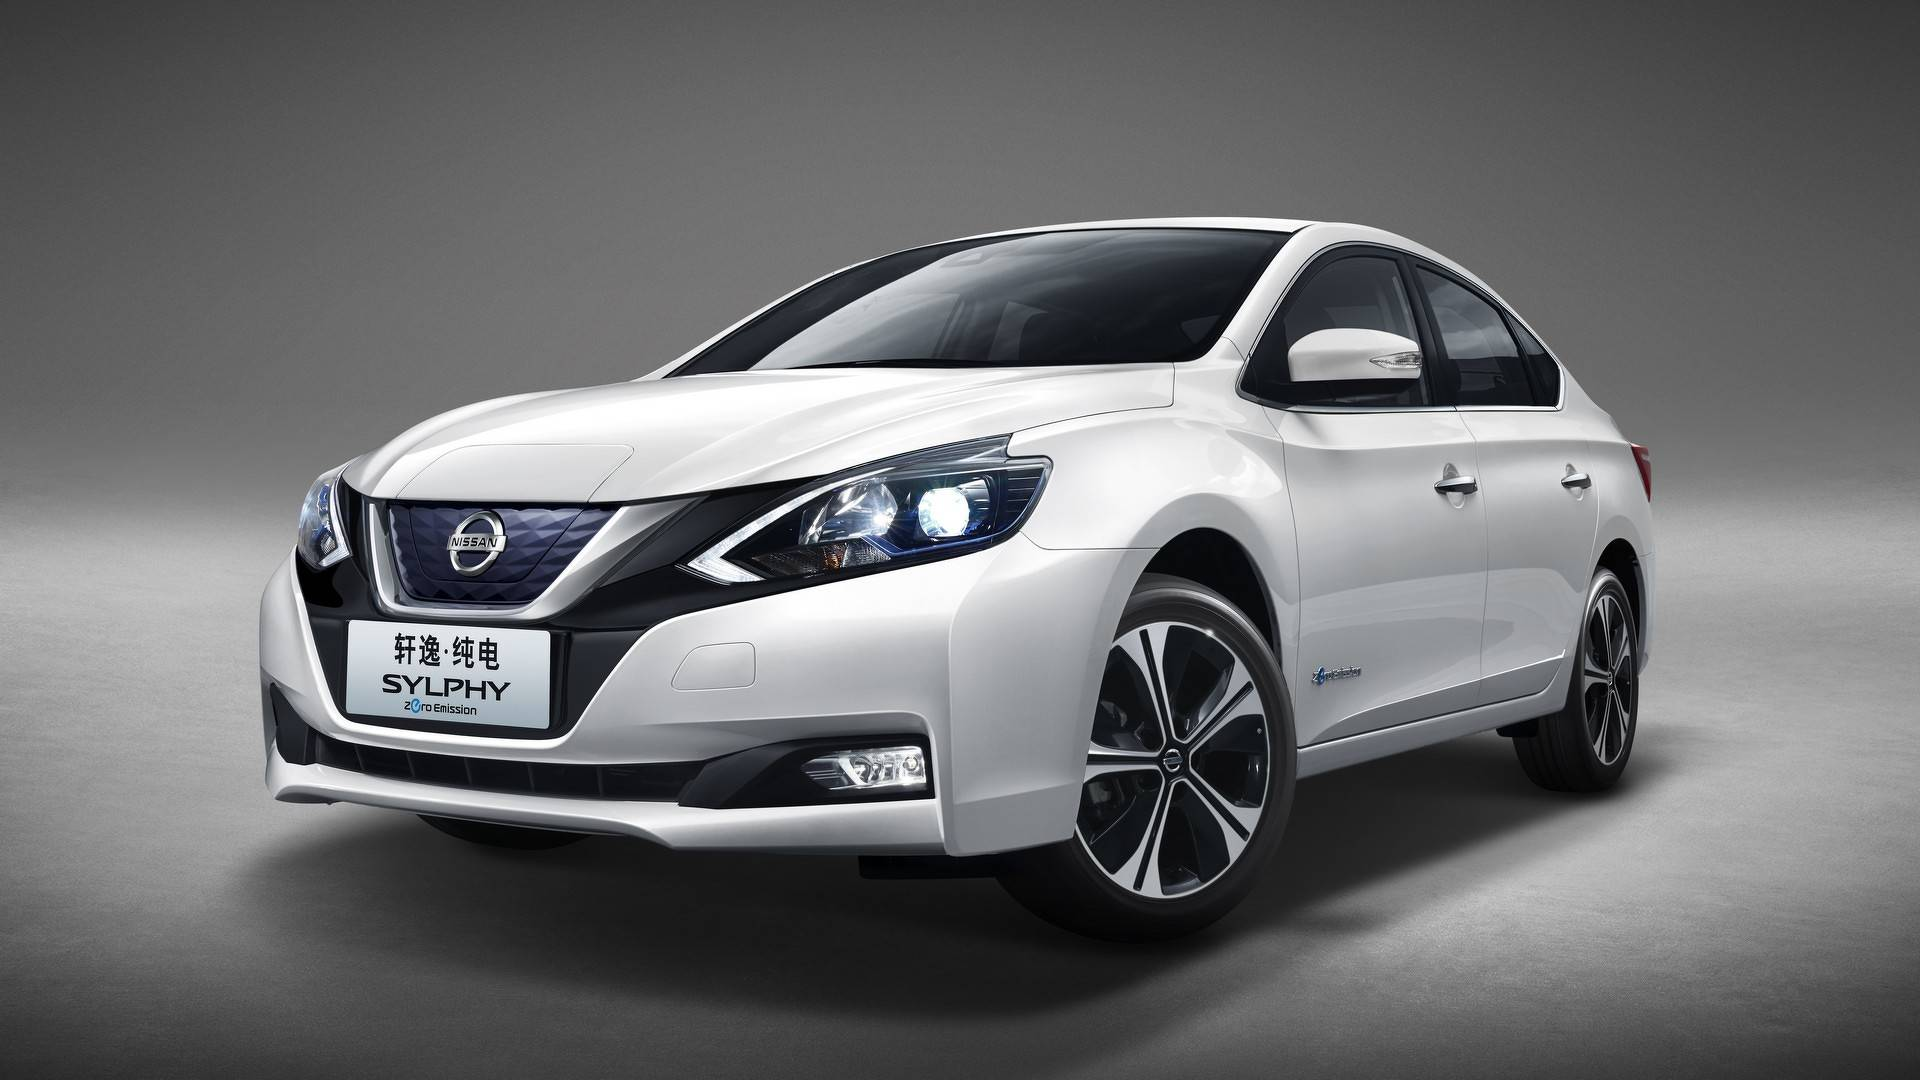 2018 Nissan Sylphy >> 2018 Nissan Sylphy Zero Emission is Half Sentra, Half Leaf - autoevolution